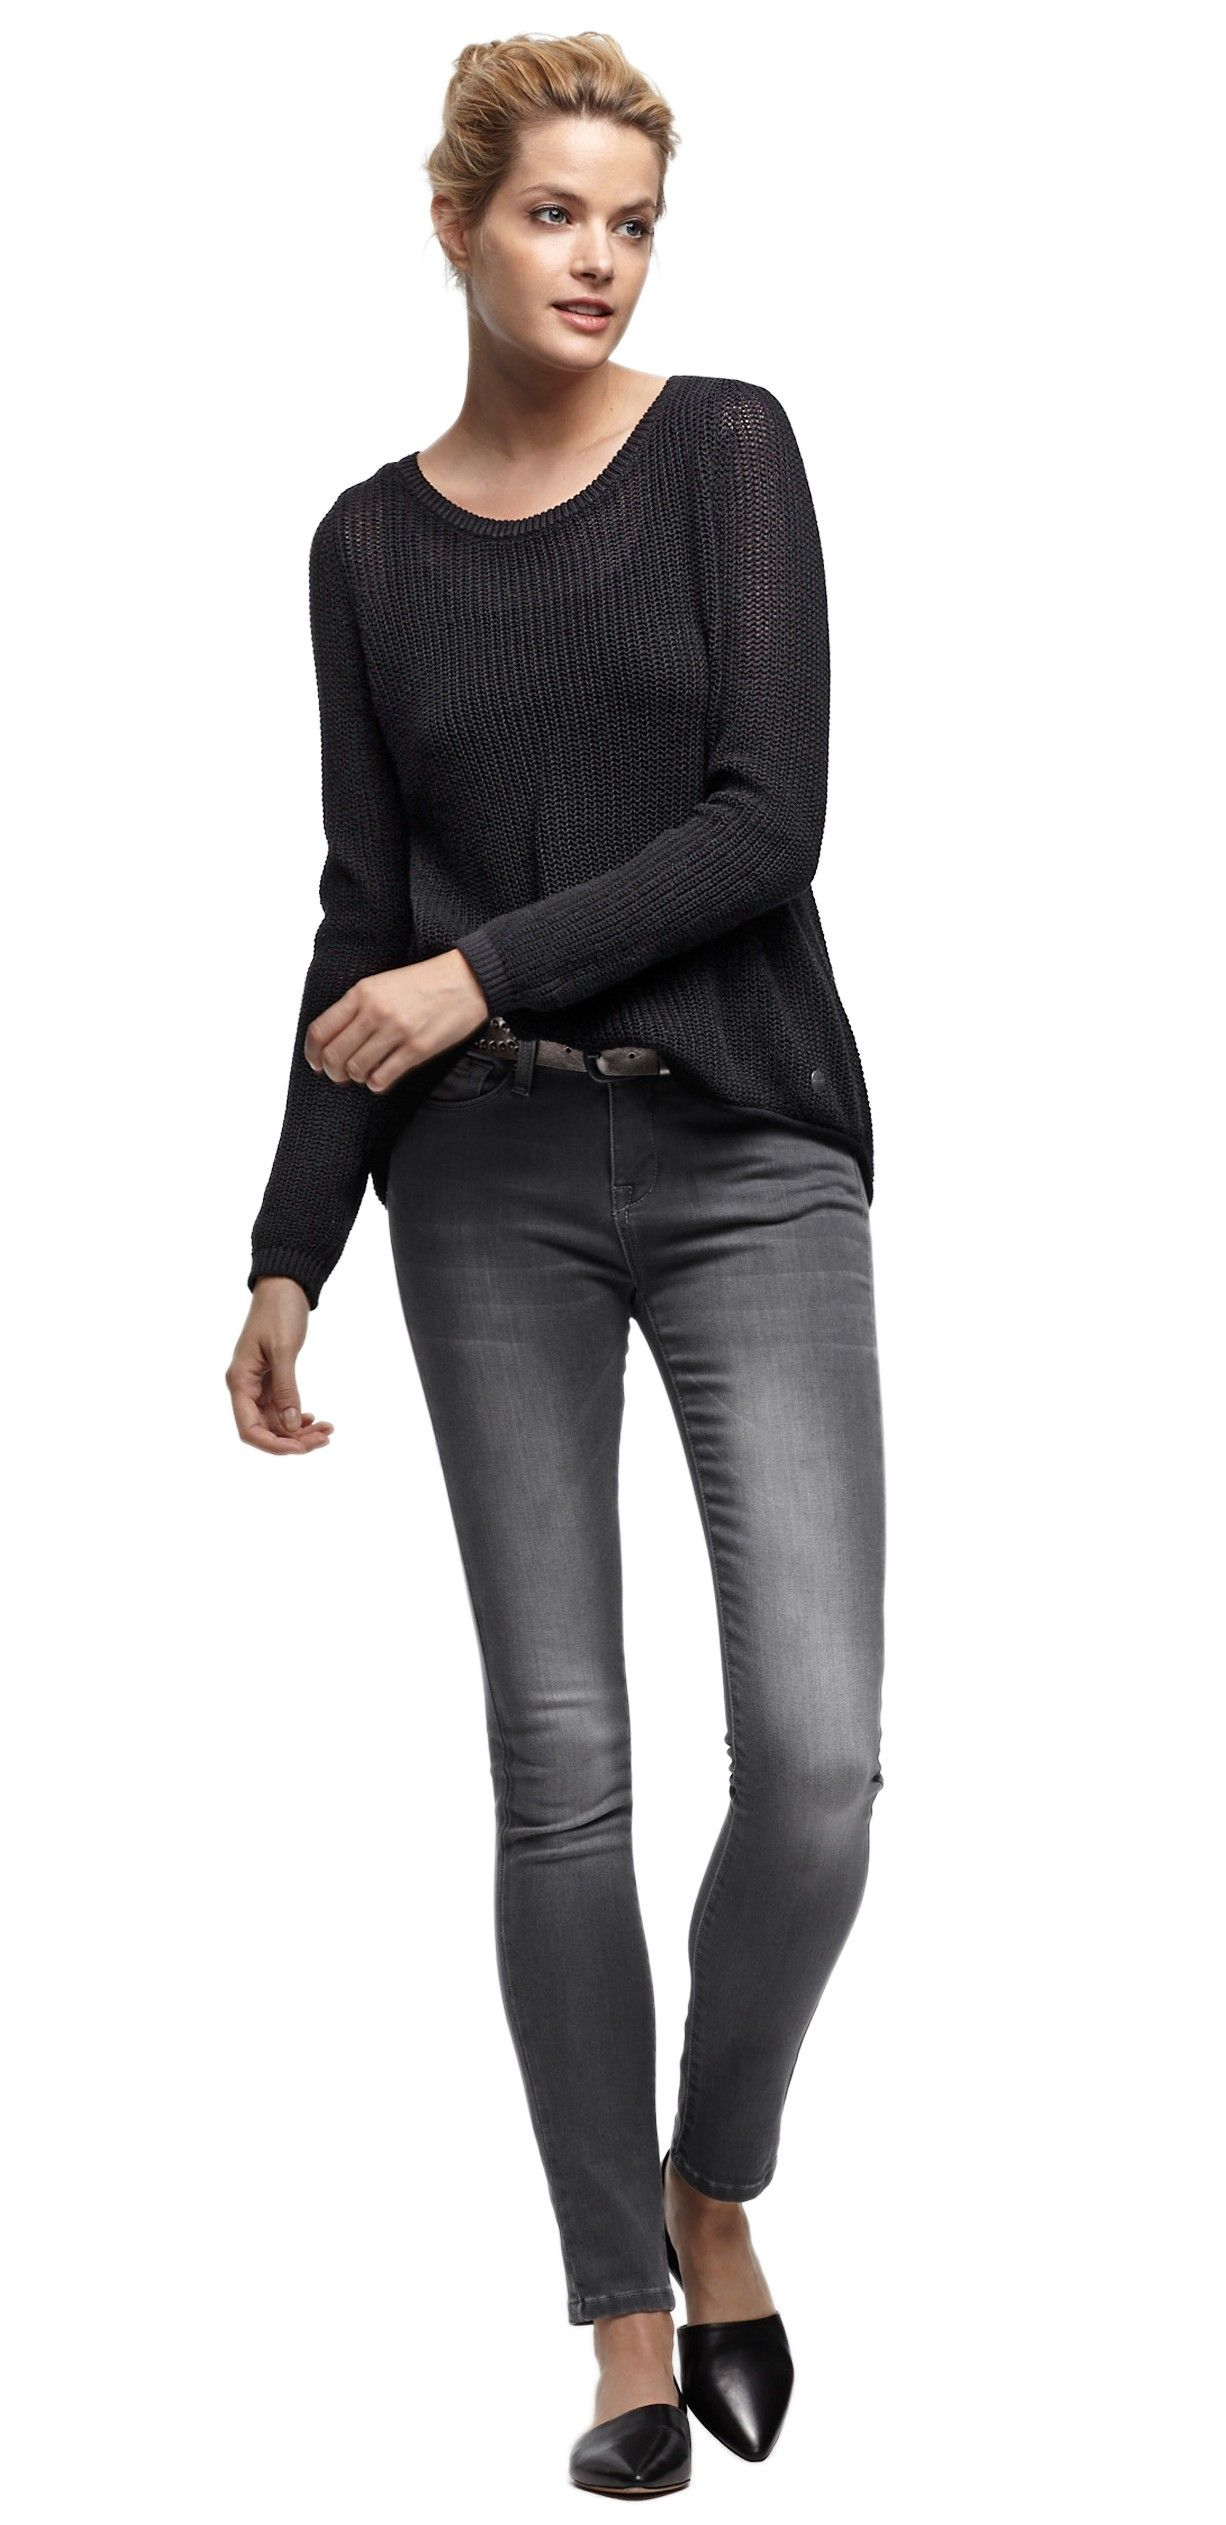 Patzi Outfits Opus Fashion Kleidung Online Kaufen Mode Mode Fur Frauen